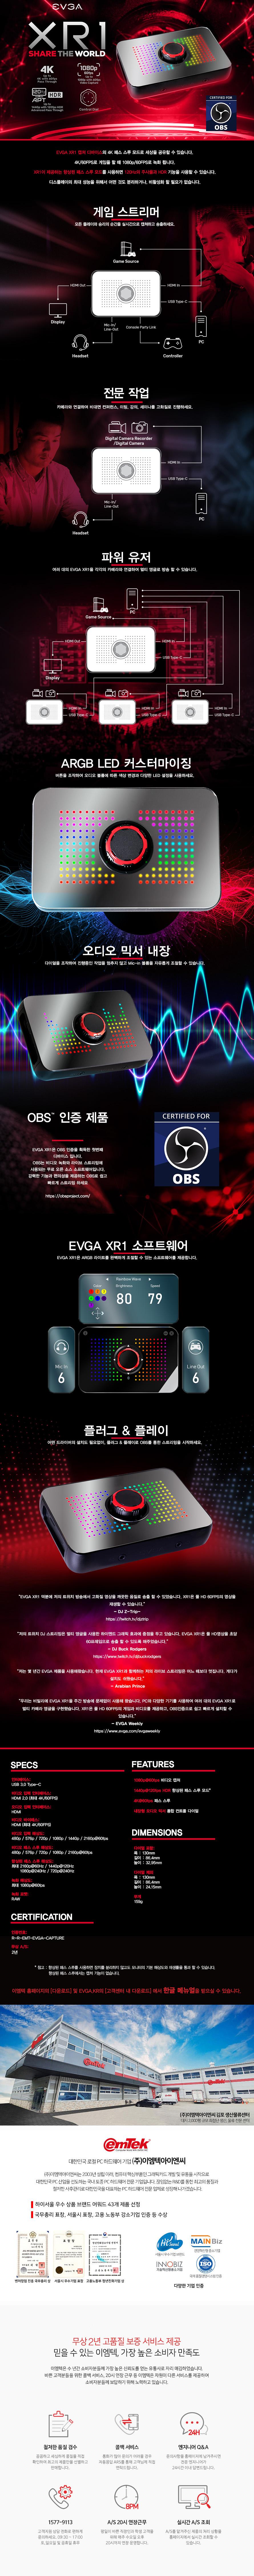 EVGA XR1